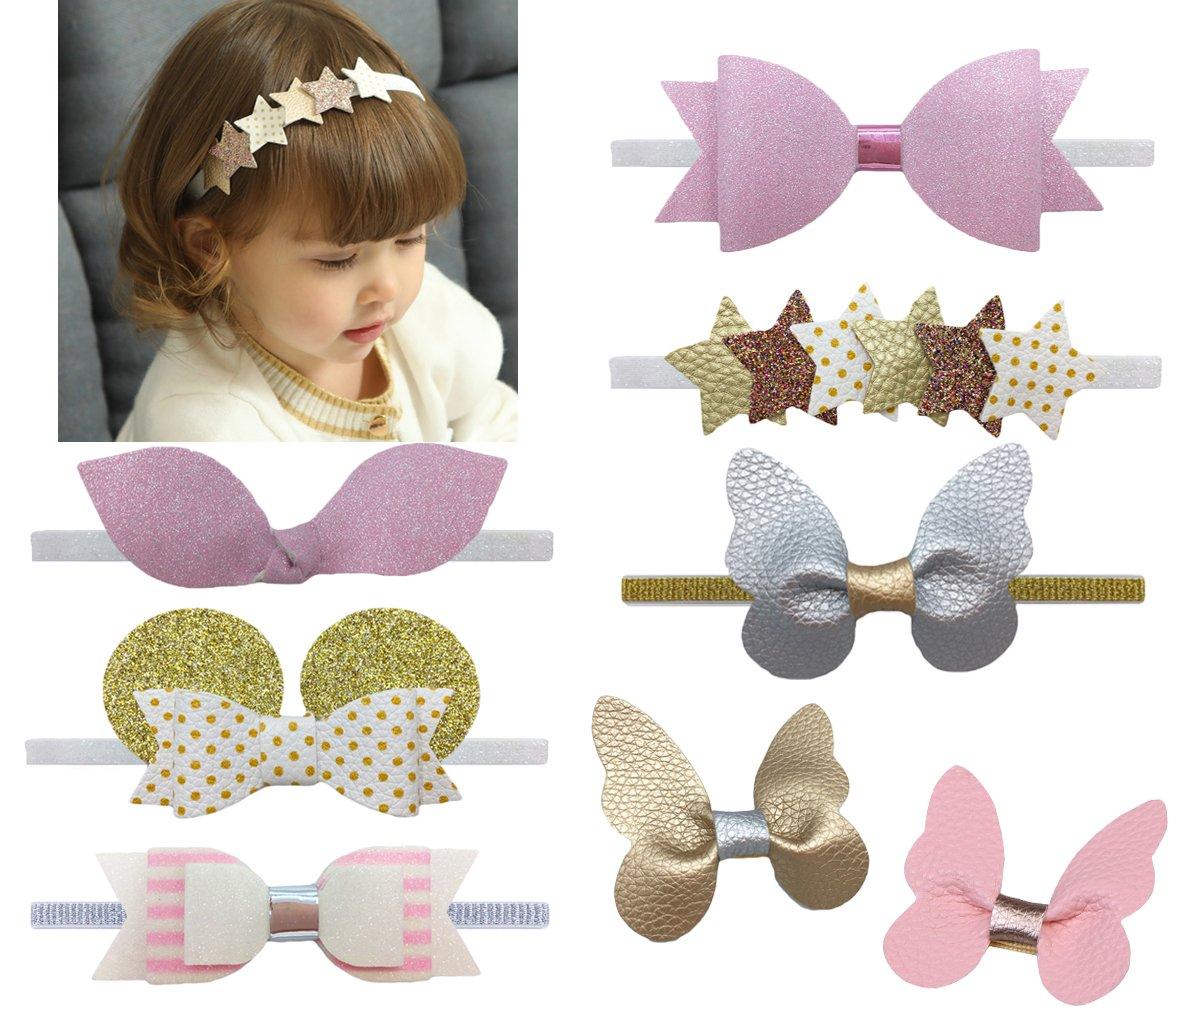 DANMY Baby Girl Rhinestone Crown Headbands Toddler Princess Headband Hair Accessories (Band and Clip (8pcs))